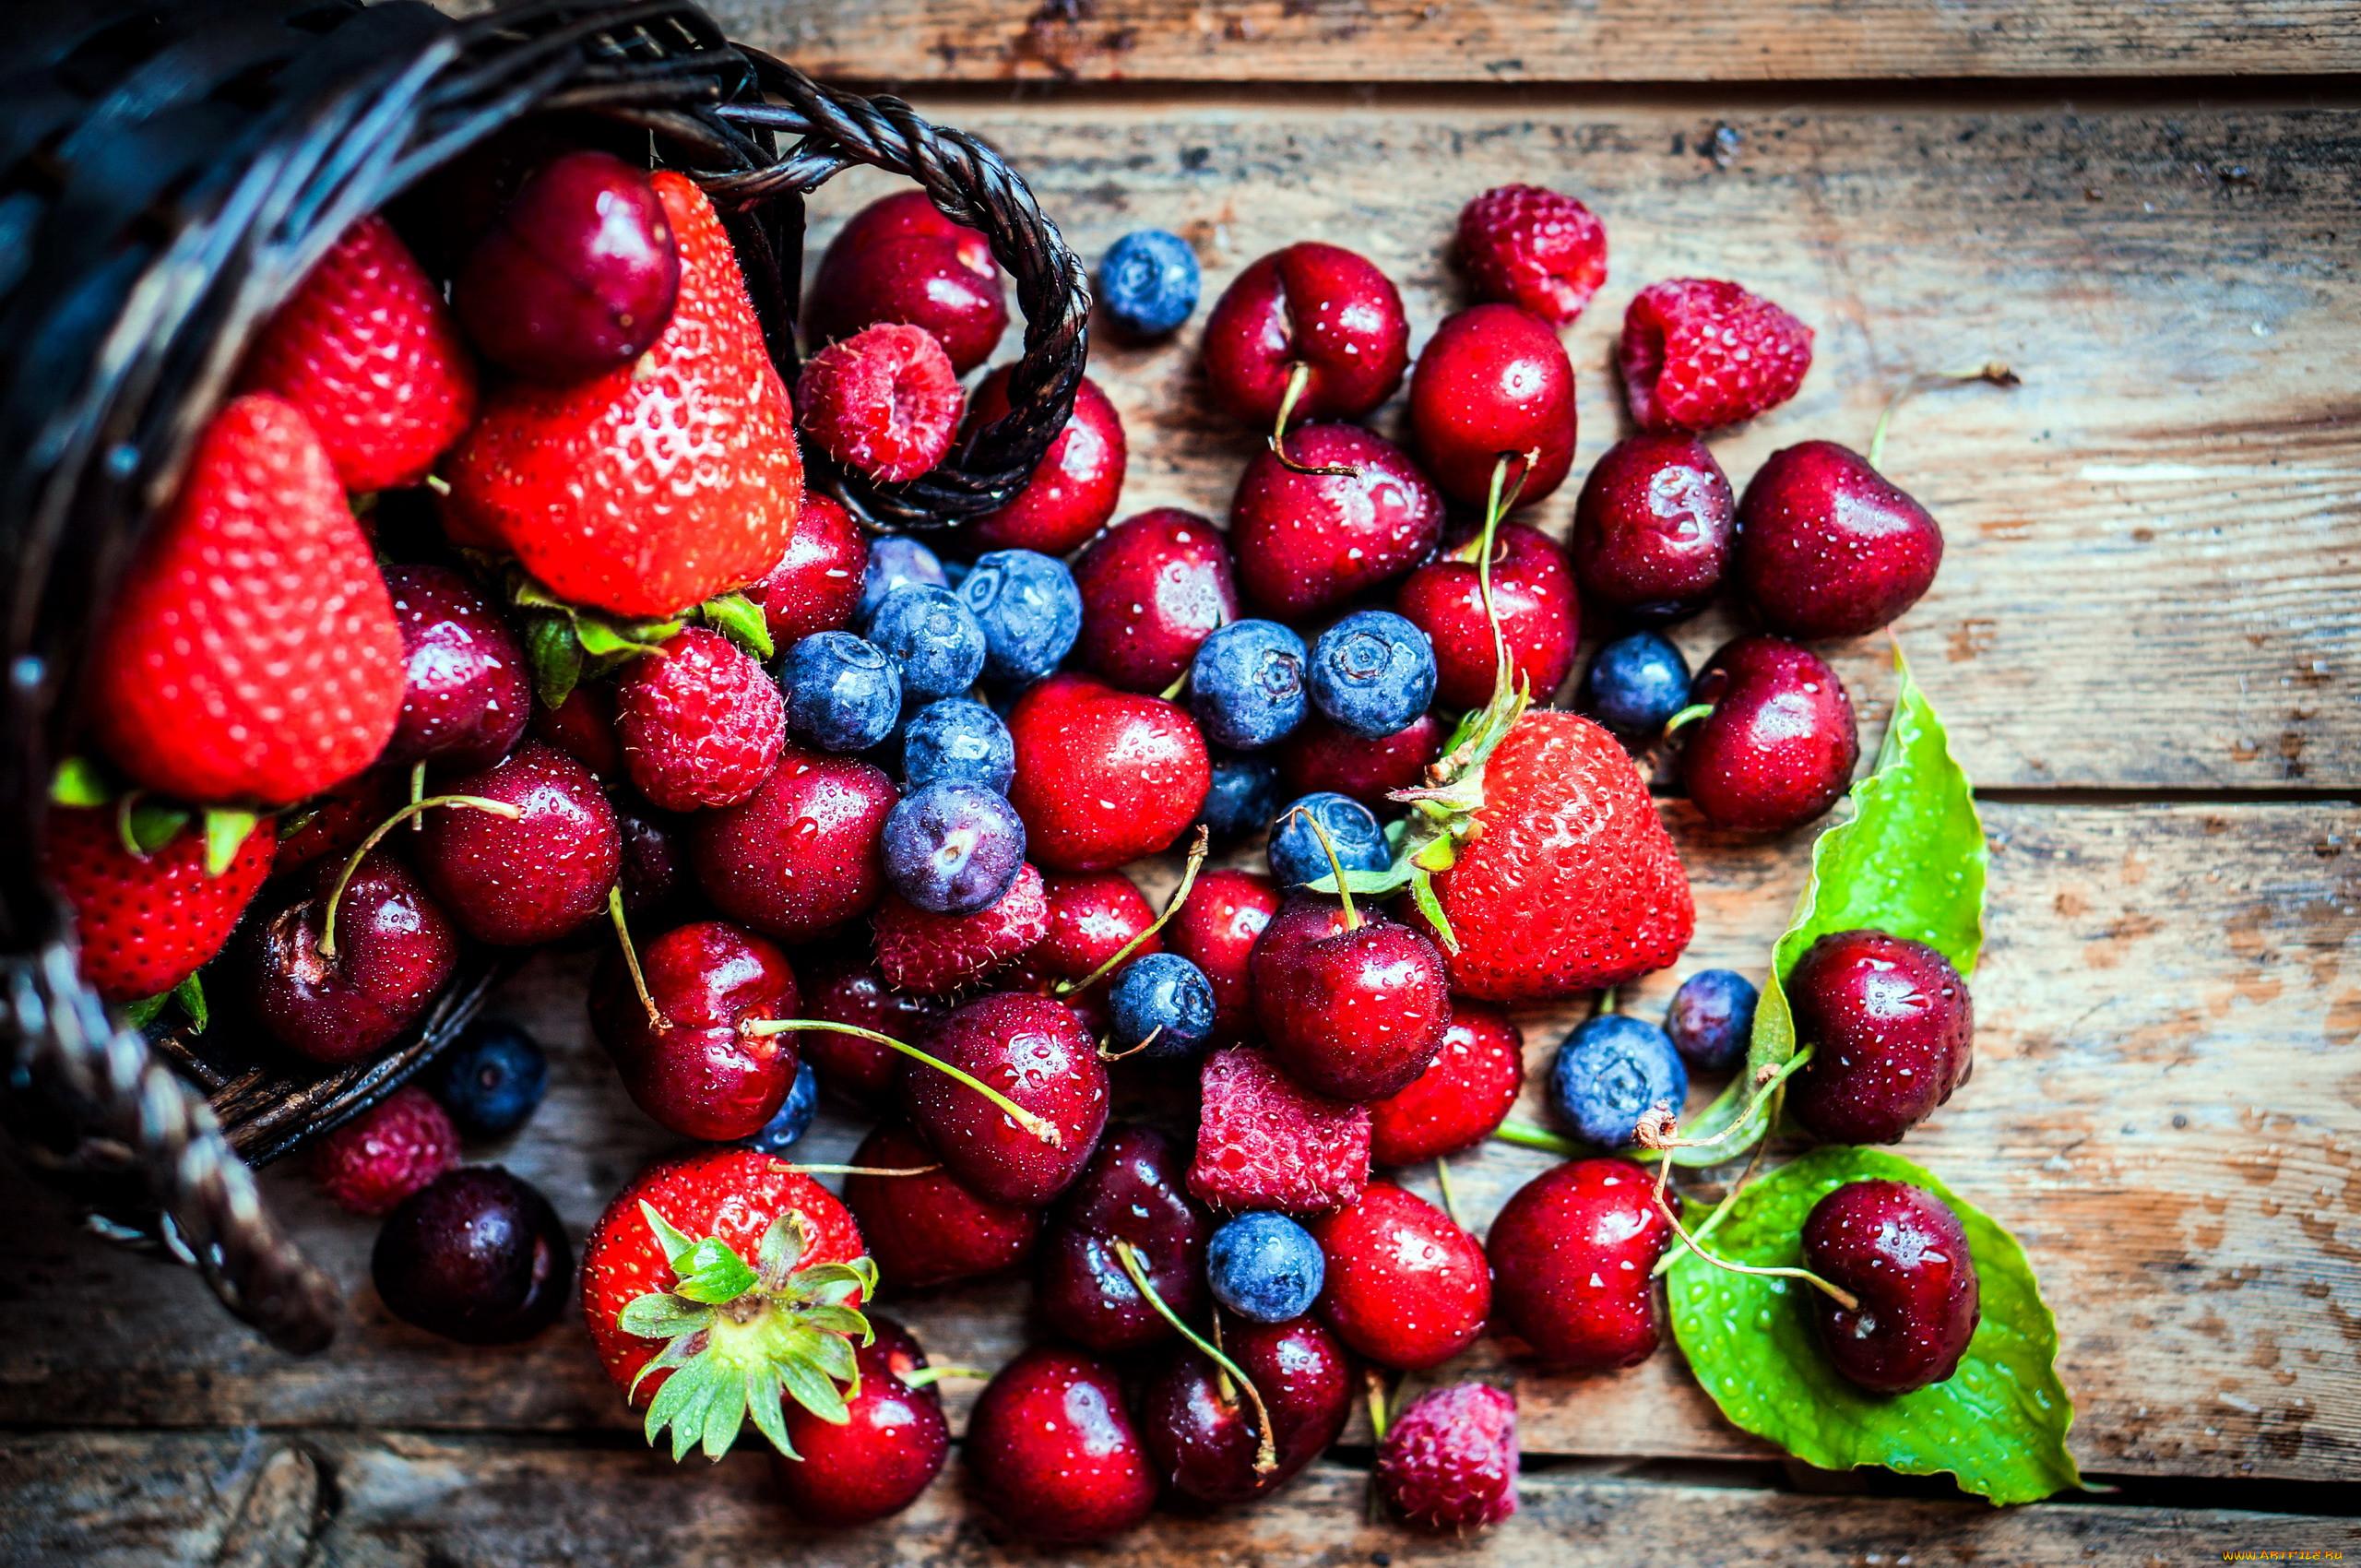 Картинка ягода красивая